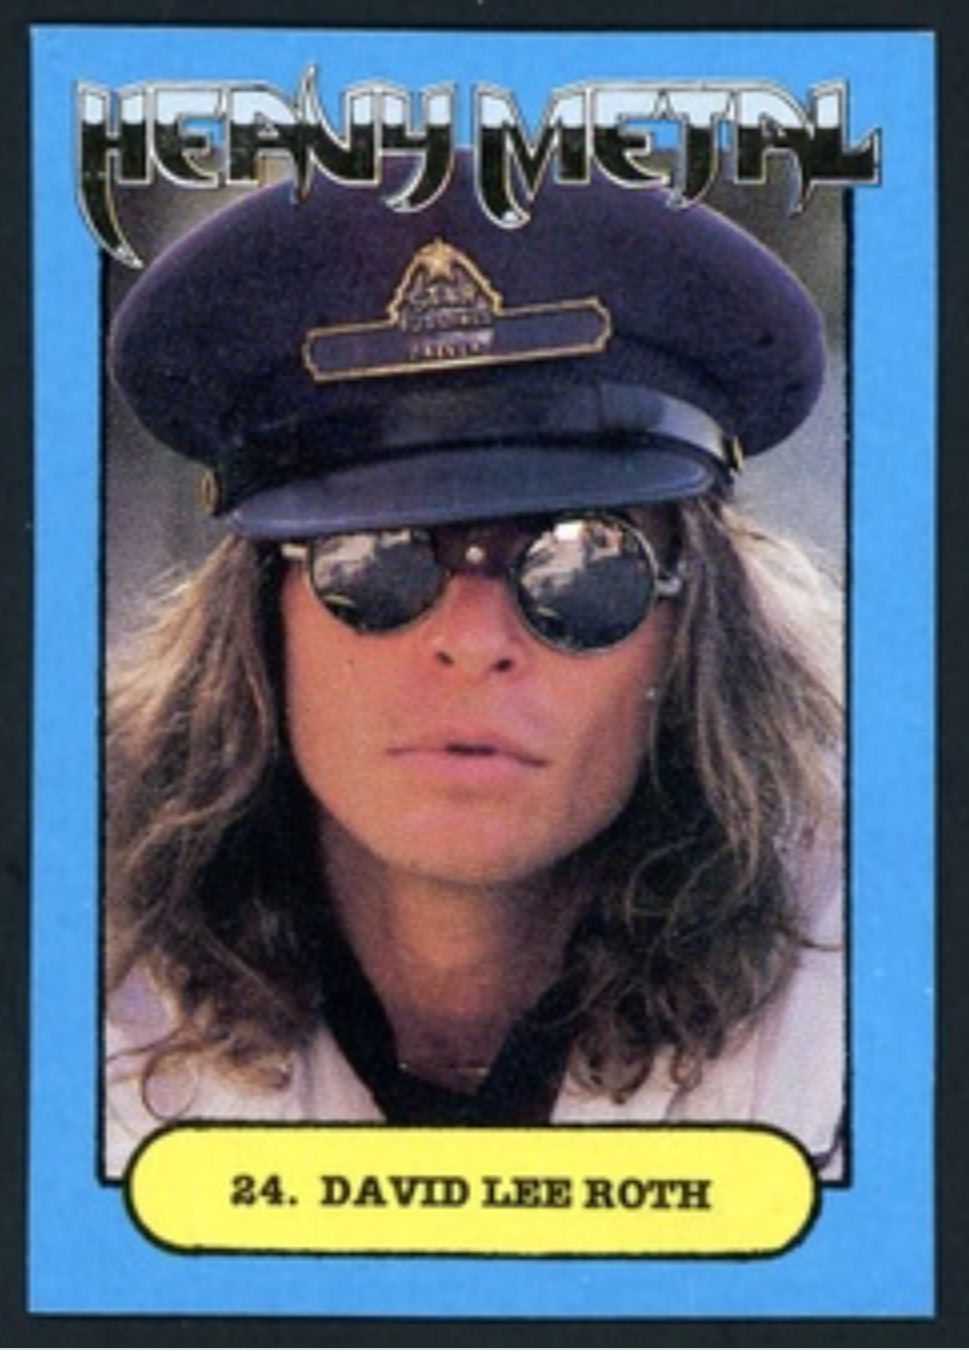 Pin By Cheryl Hunt Baker On Van Halen With Dlr David Lee Roth David Lee Van Halen